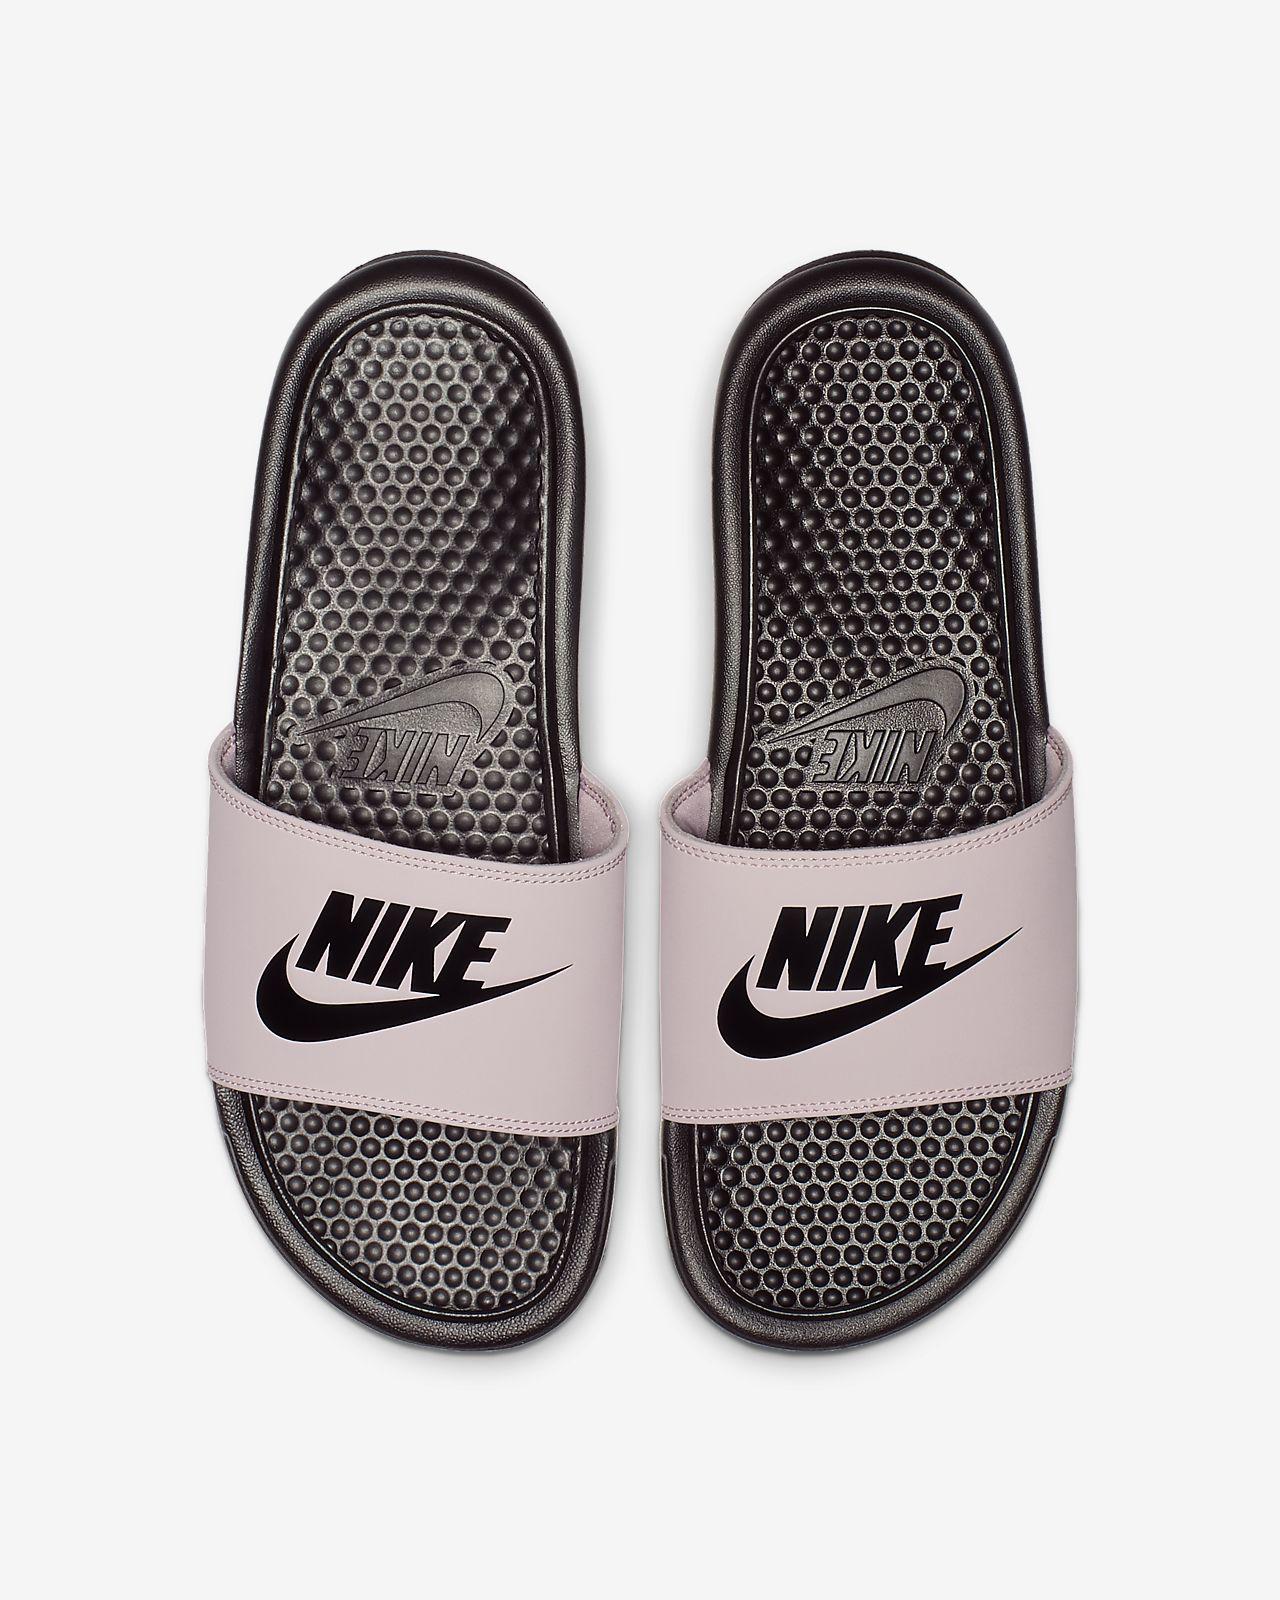 6a8cec5db0 Nike Benassi Slide. Nike.com